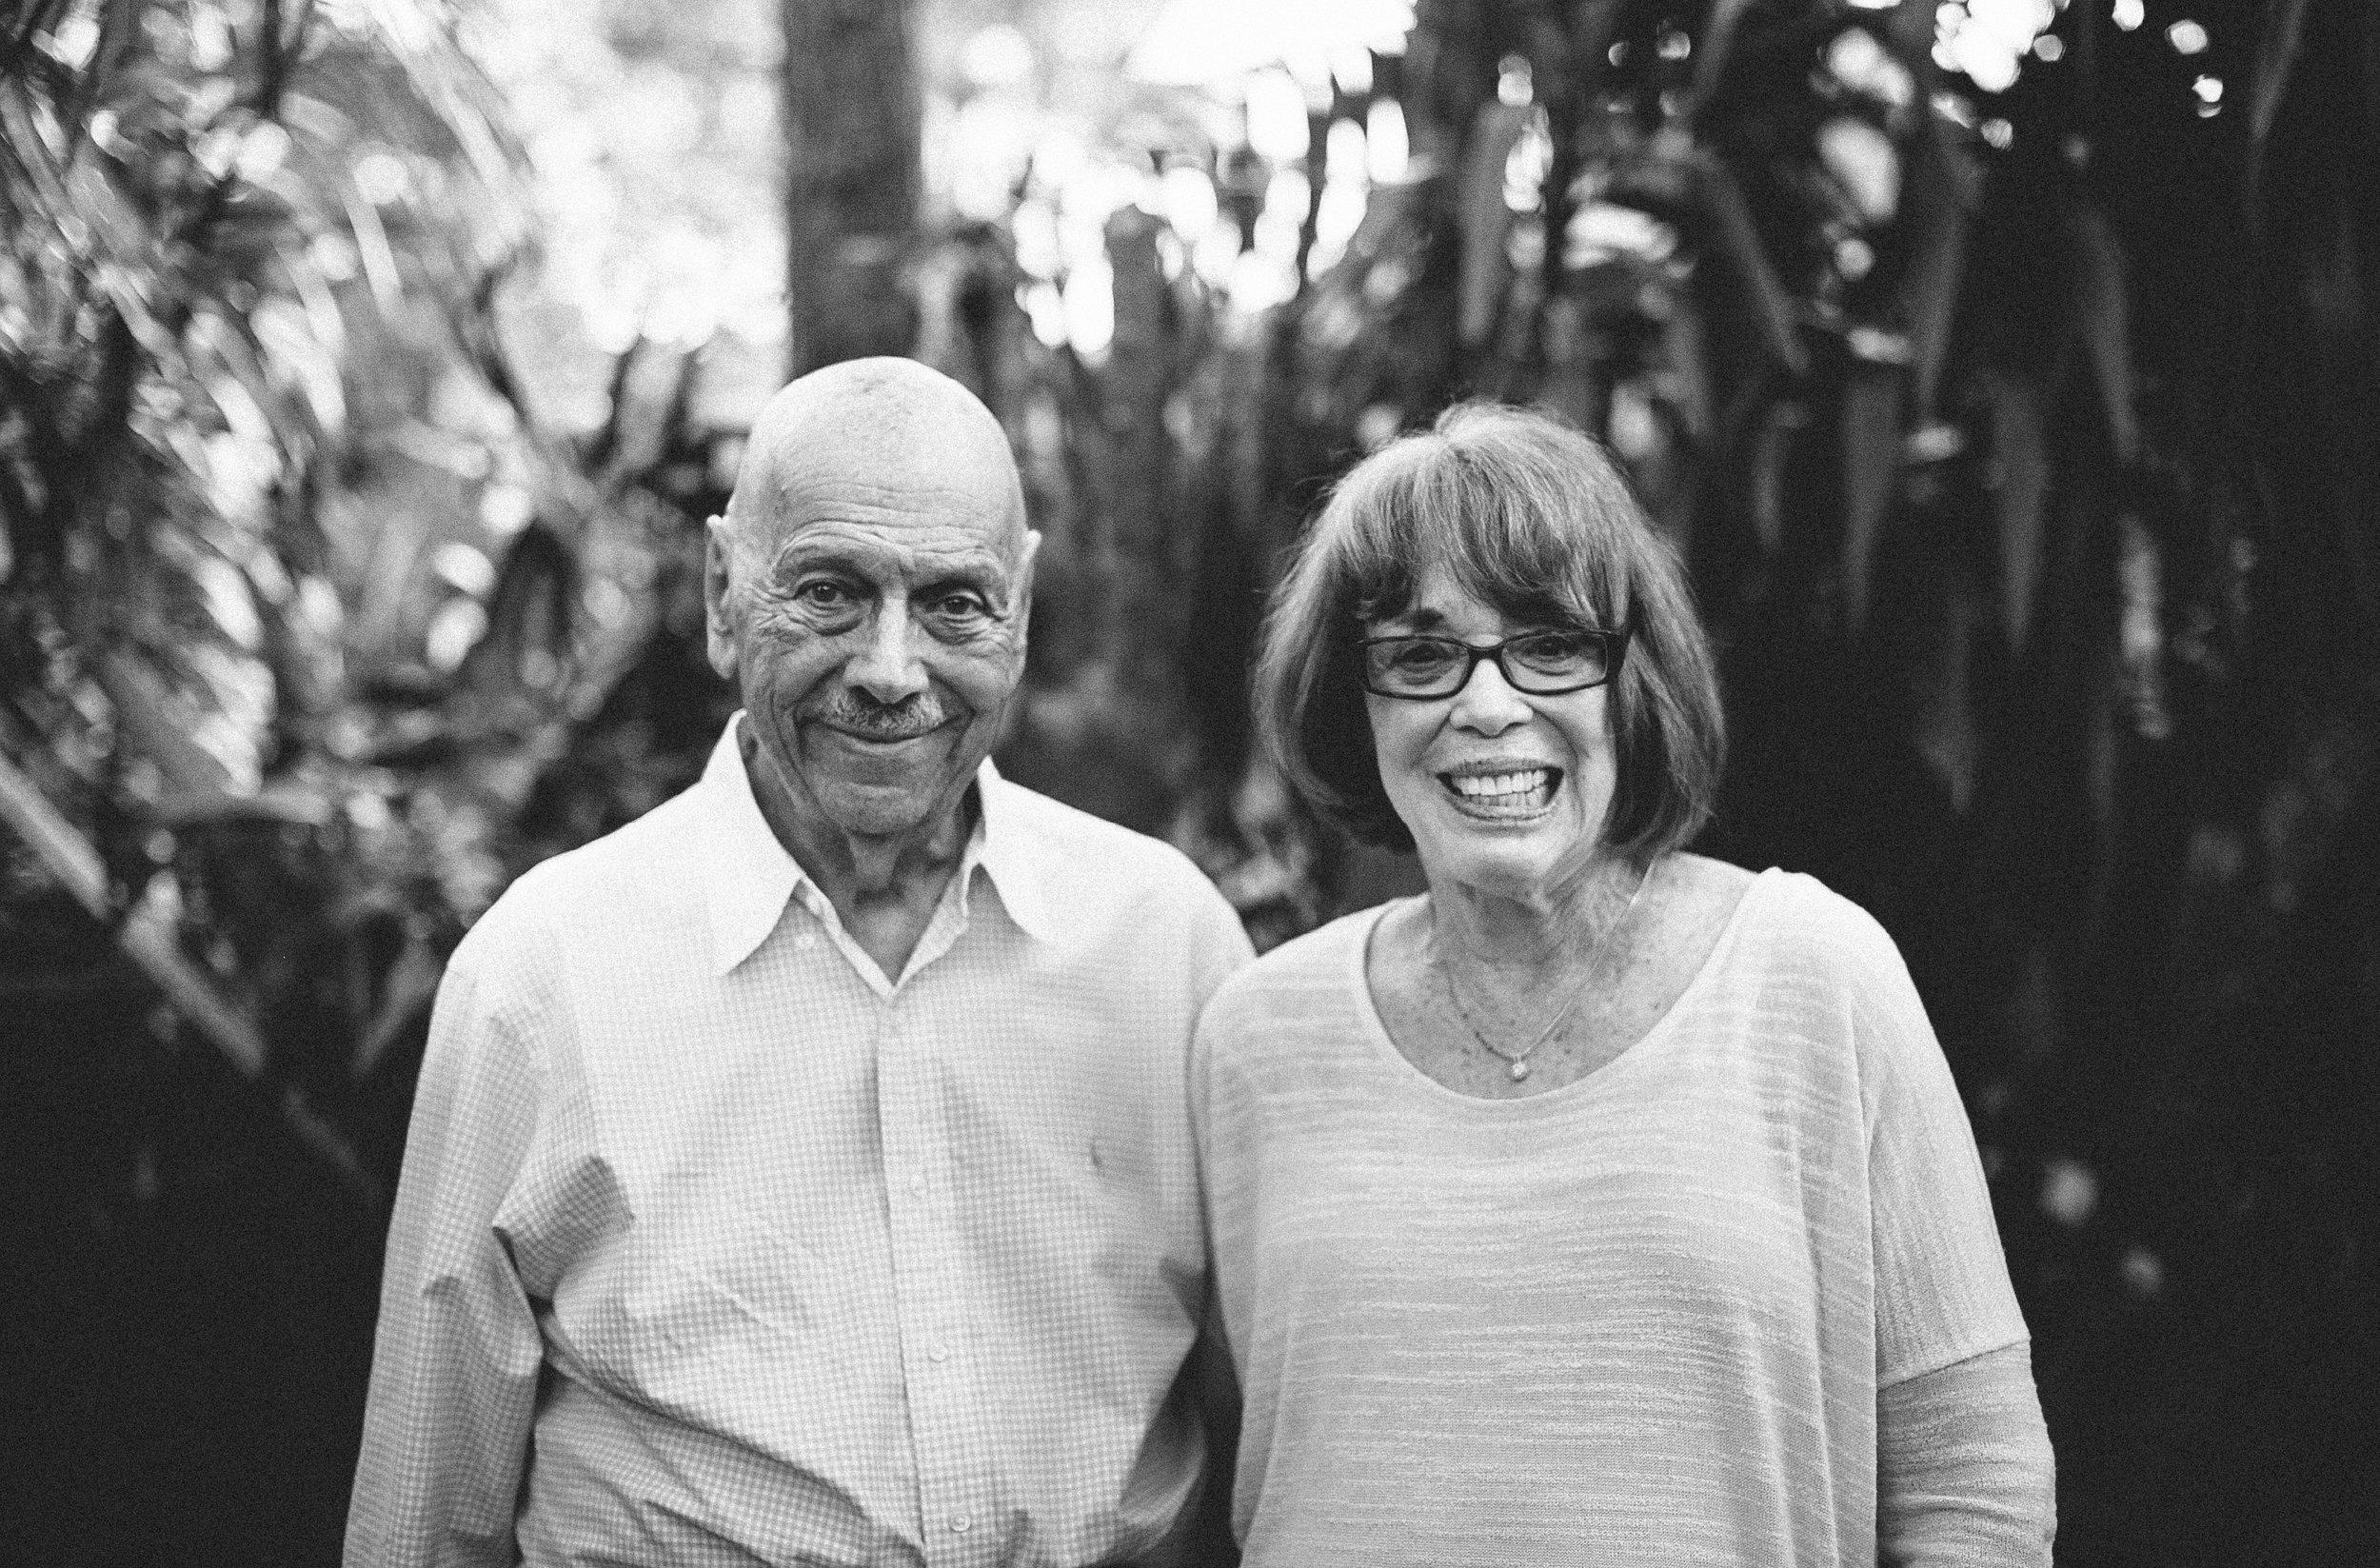 Miami 60th Anniversary Portrait Shoot28.jpg